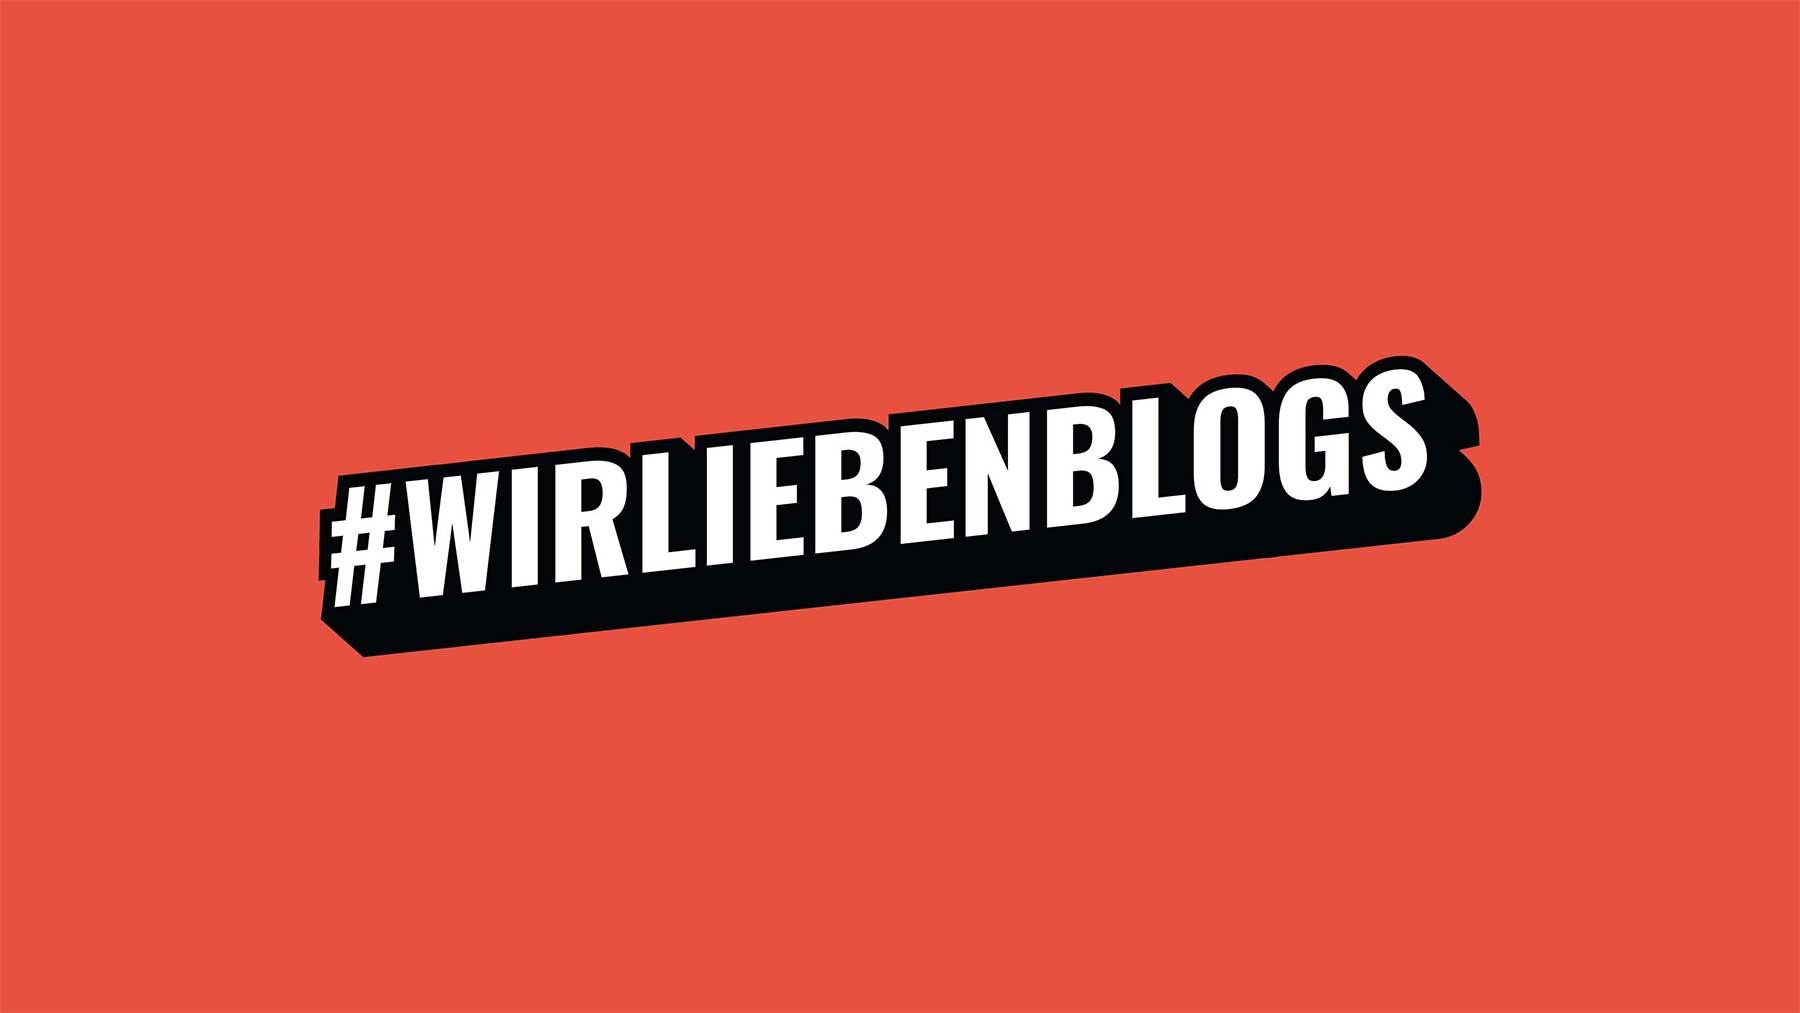 #WirliebenBlogs: Empfehlungsrunde am 27.06.2018 Wirliebenblogs-cover-art